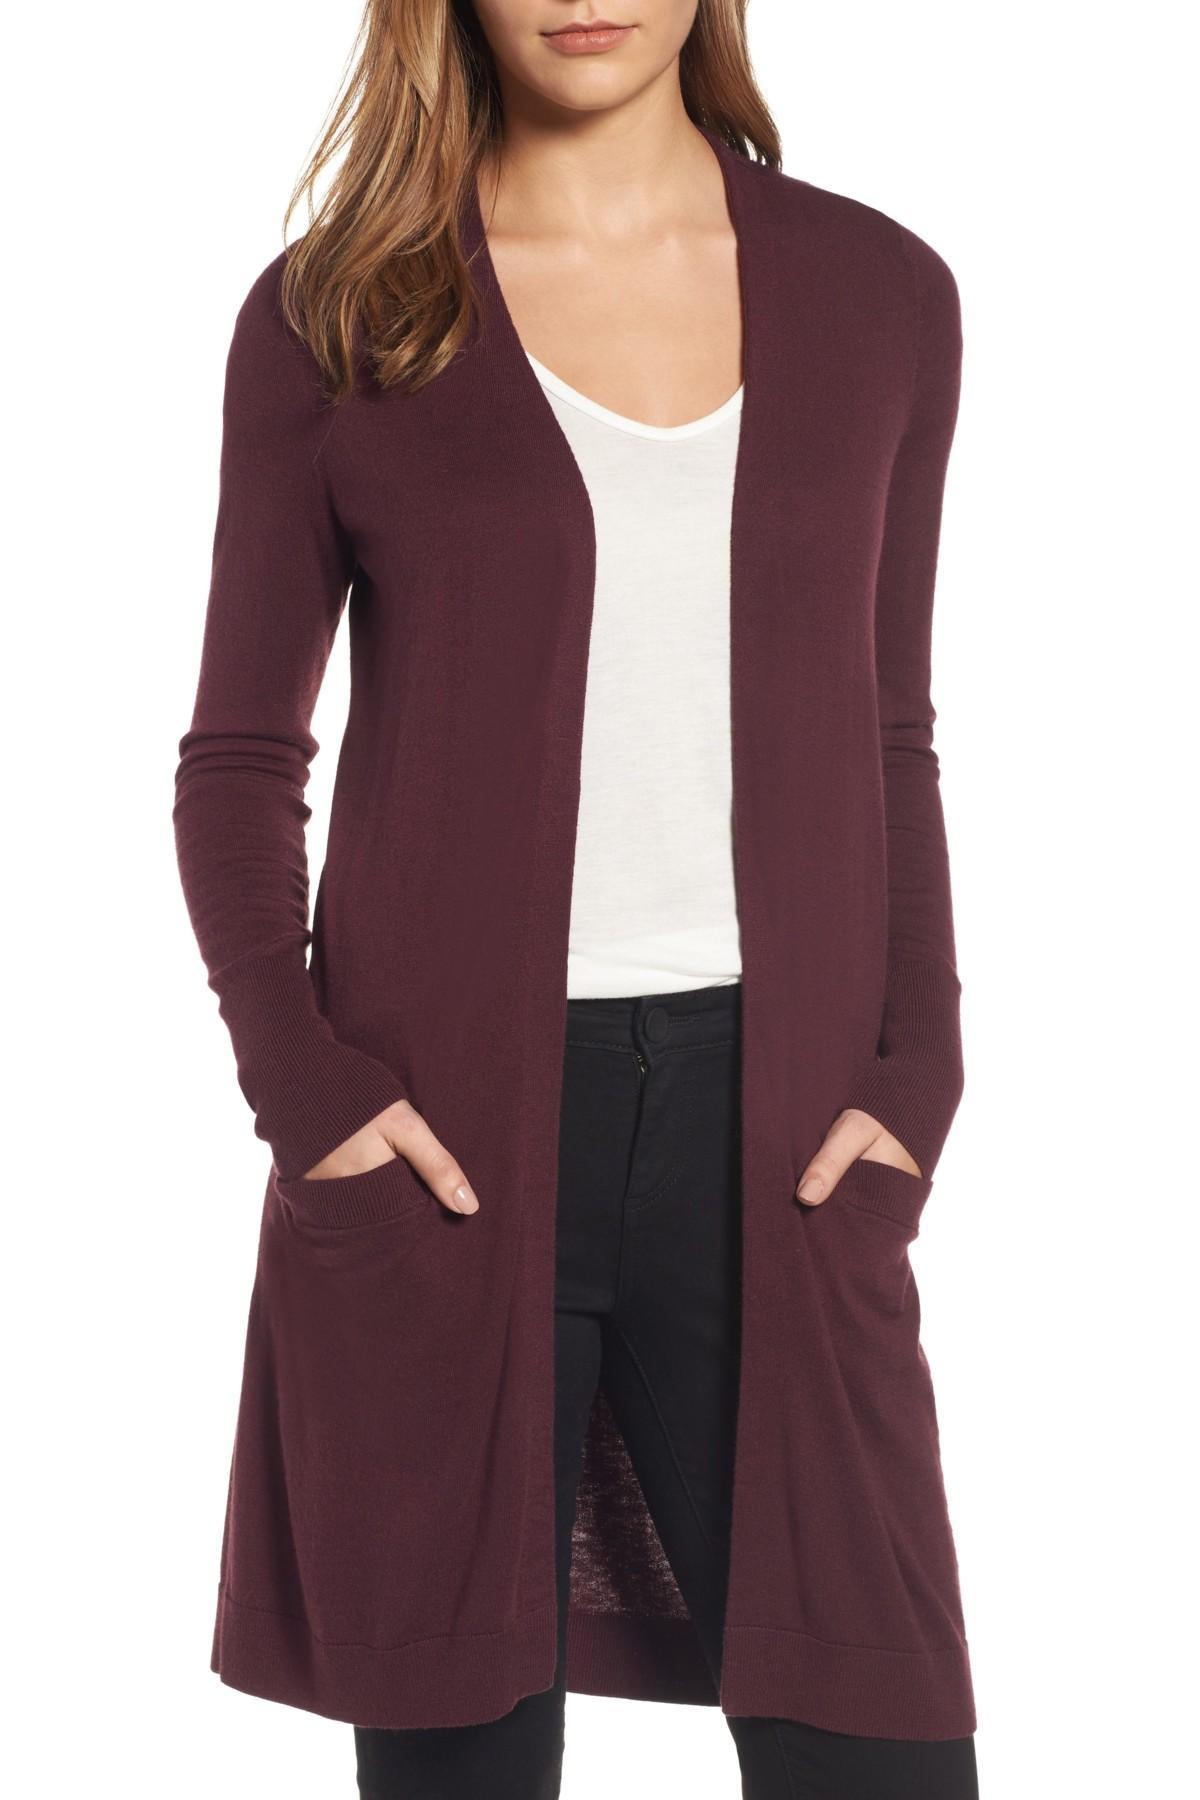 c8f2ab9b4a08 Lyst - Halogen Long Open Front Cardigan (regular   Petite) in Purple